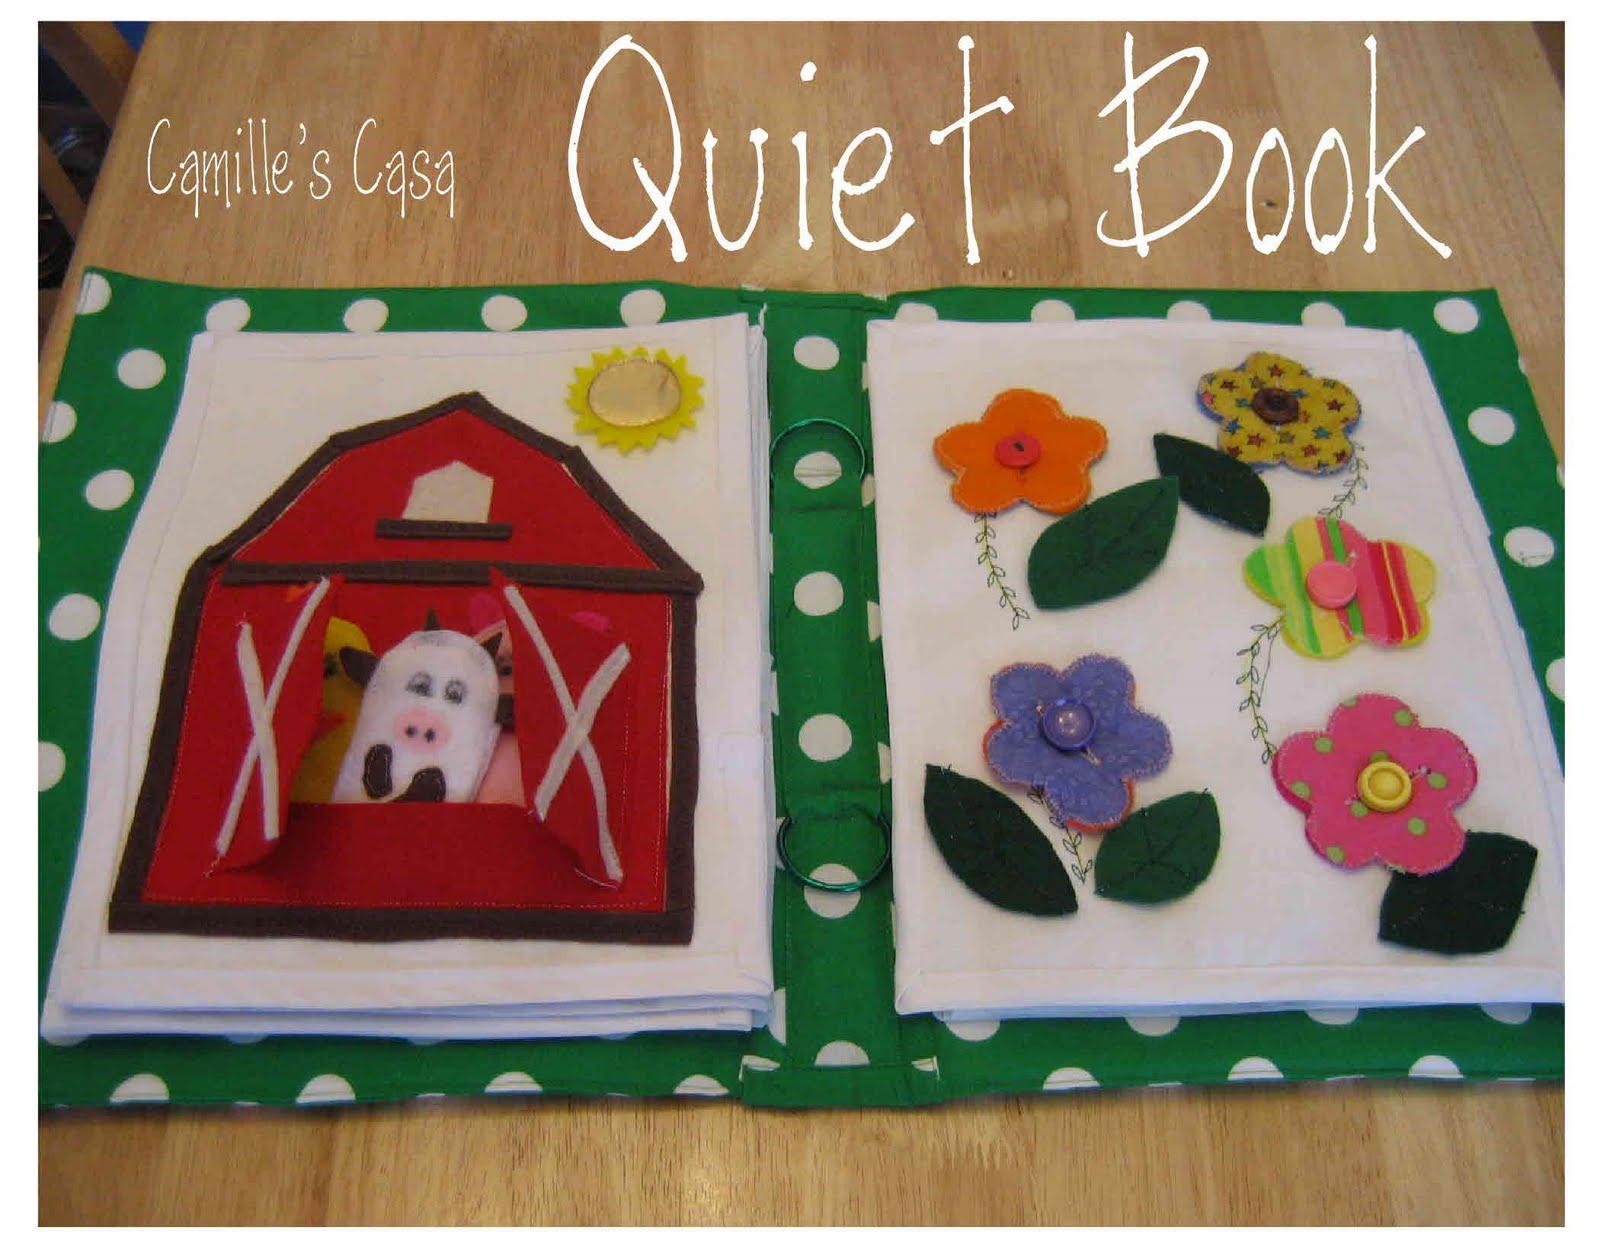 Quiet Book Cover Template : Camille s casa quiet book revealed